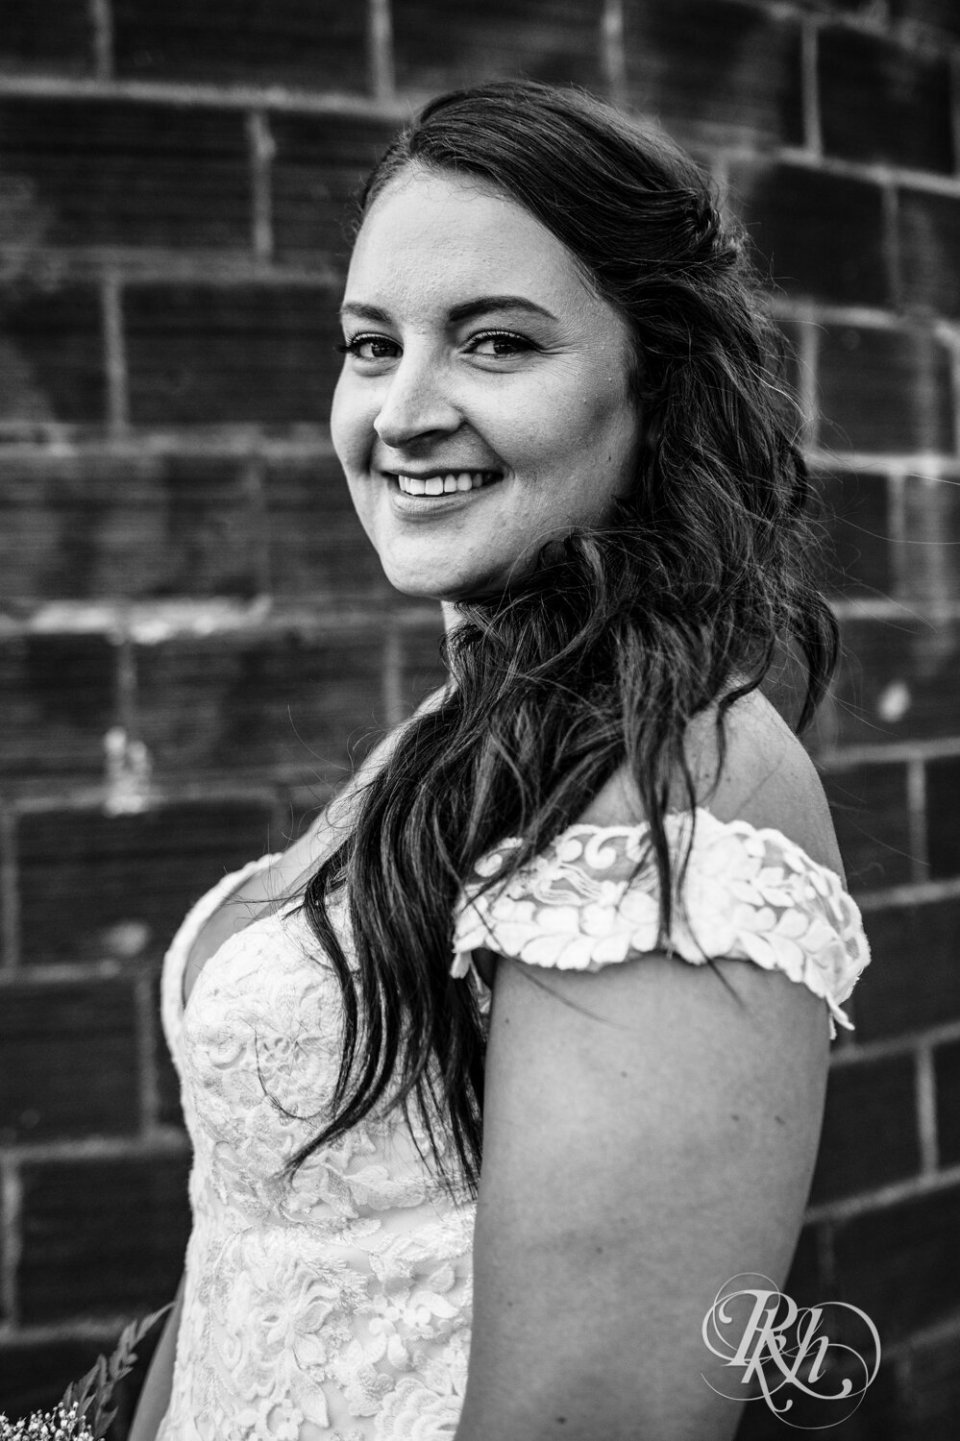 Jolene, bridal black and white photo